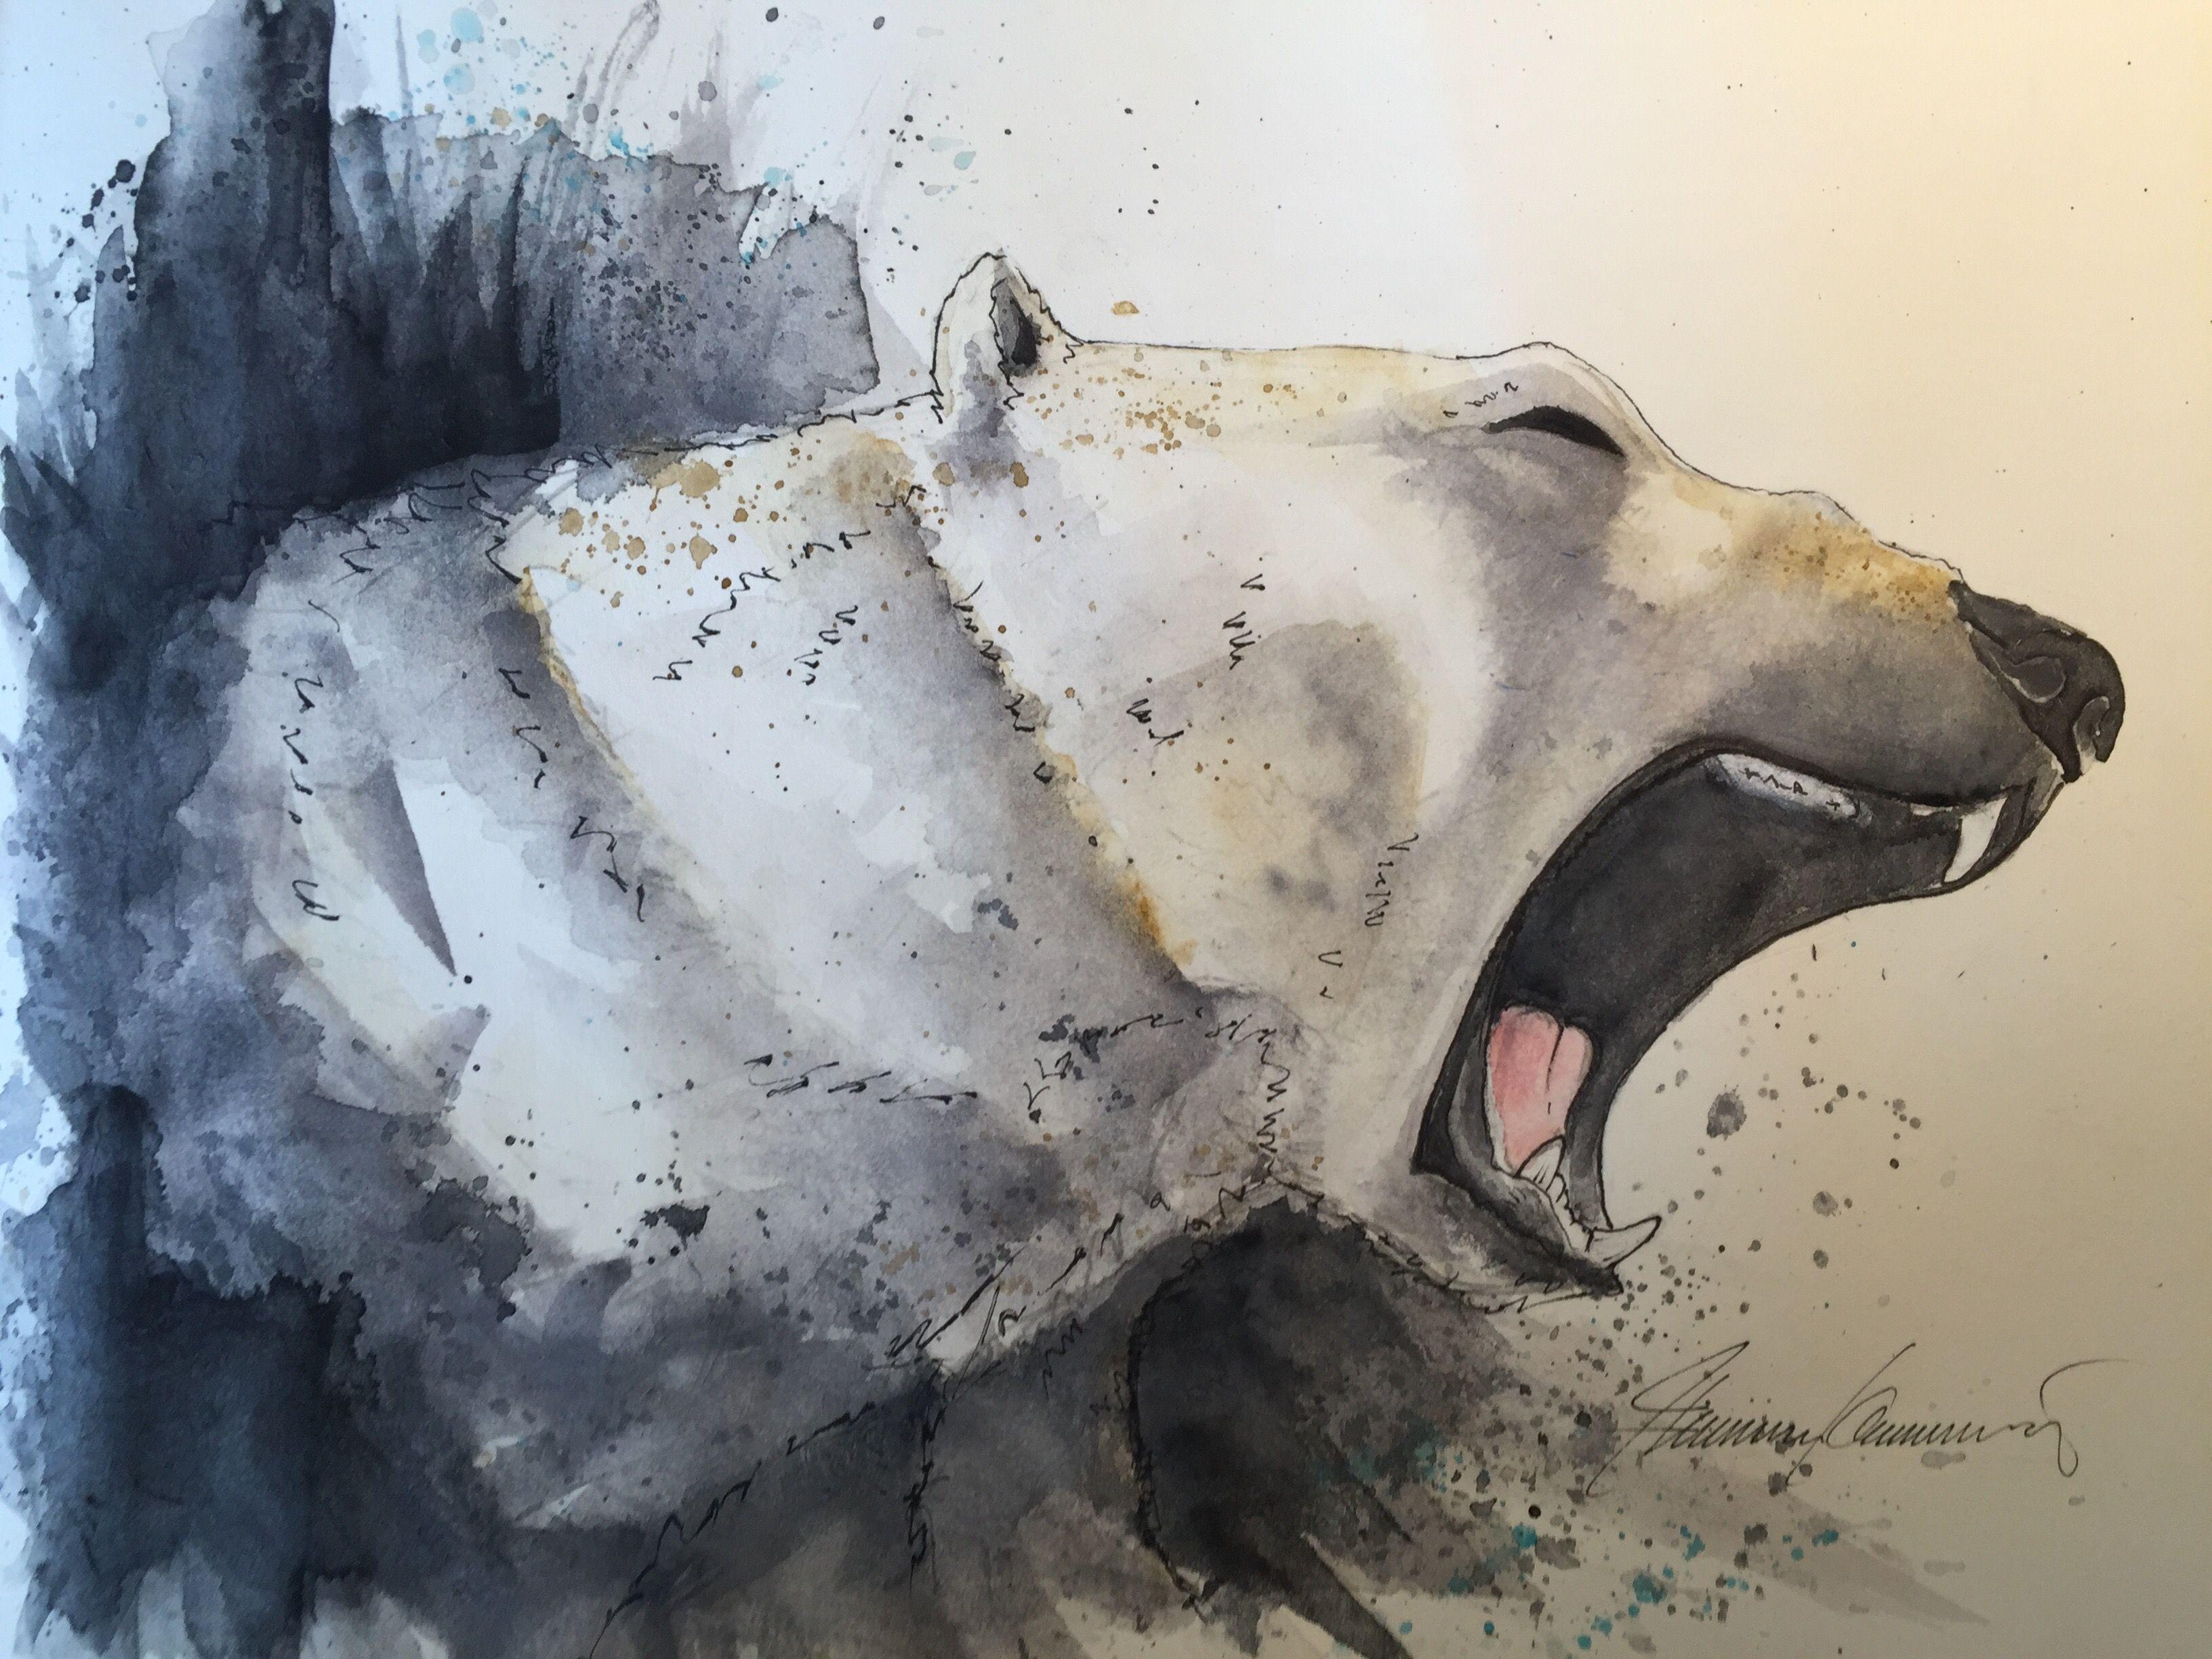 Polar Bear, Eisbär, A4, Aquarell, Sketch, Zeichnung | Mindhouse ...